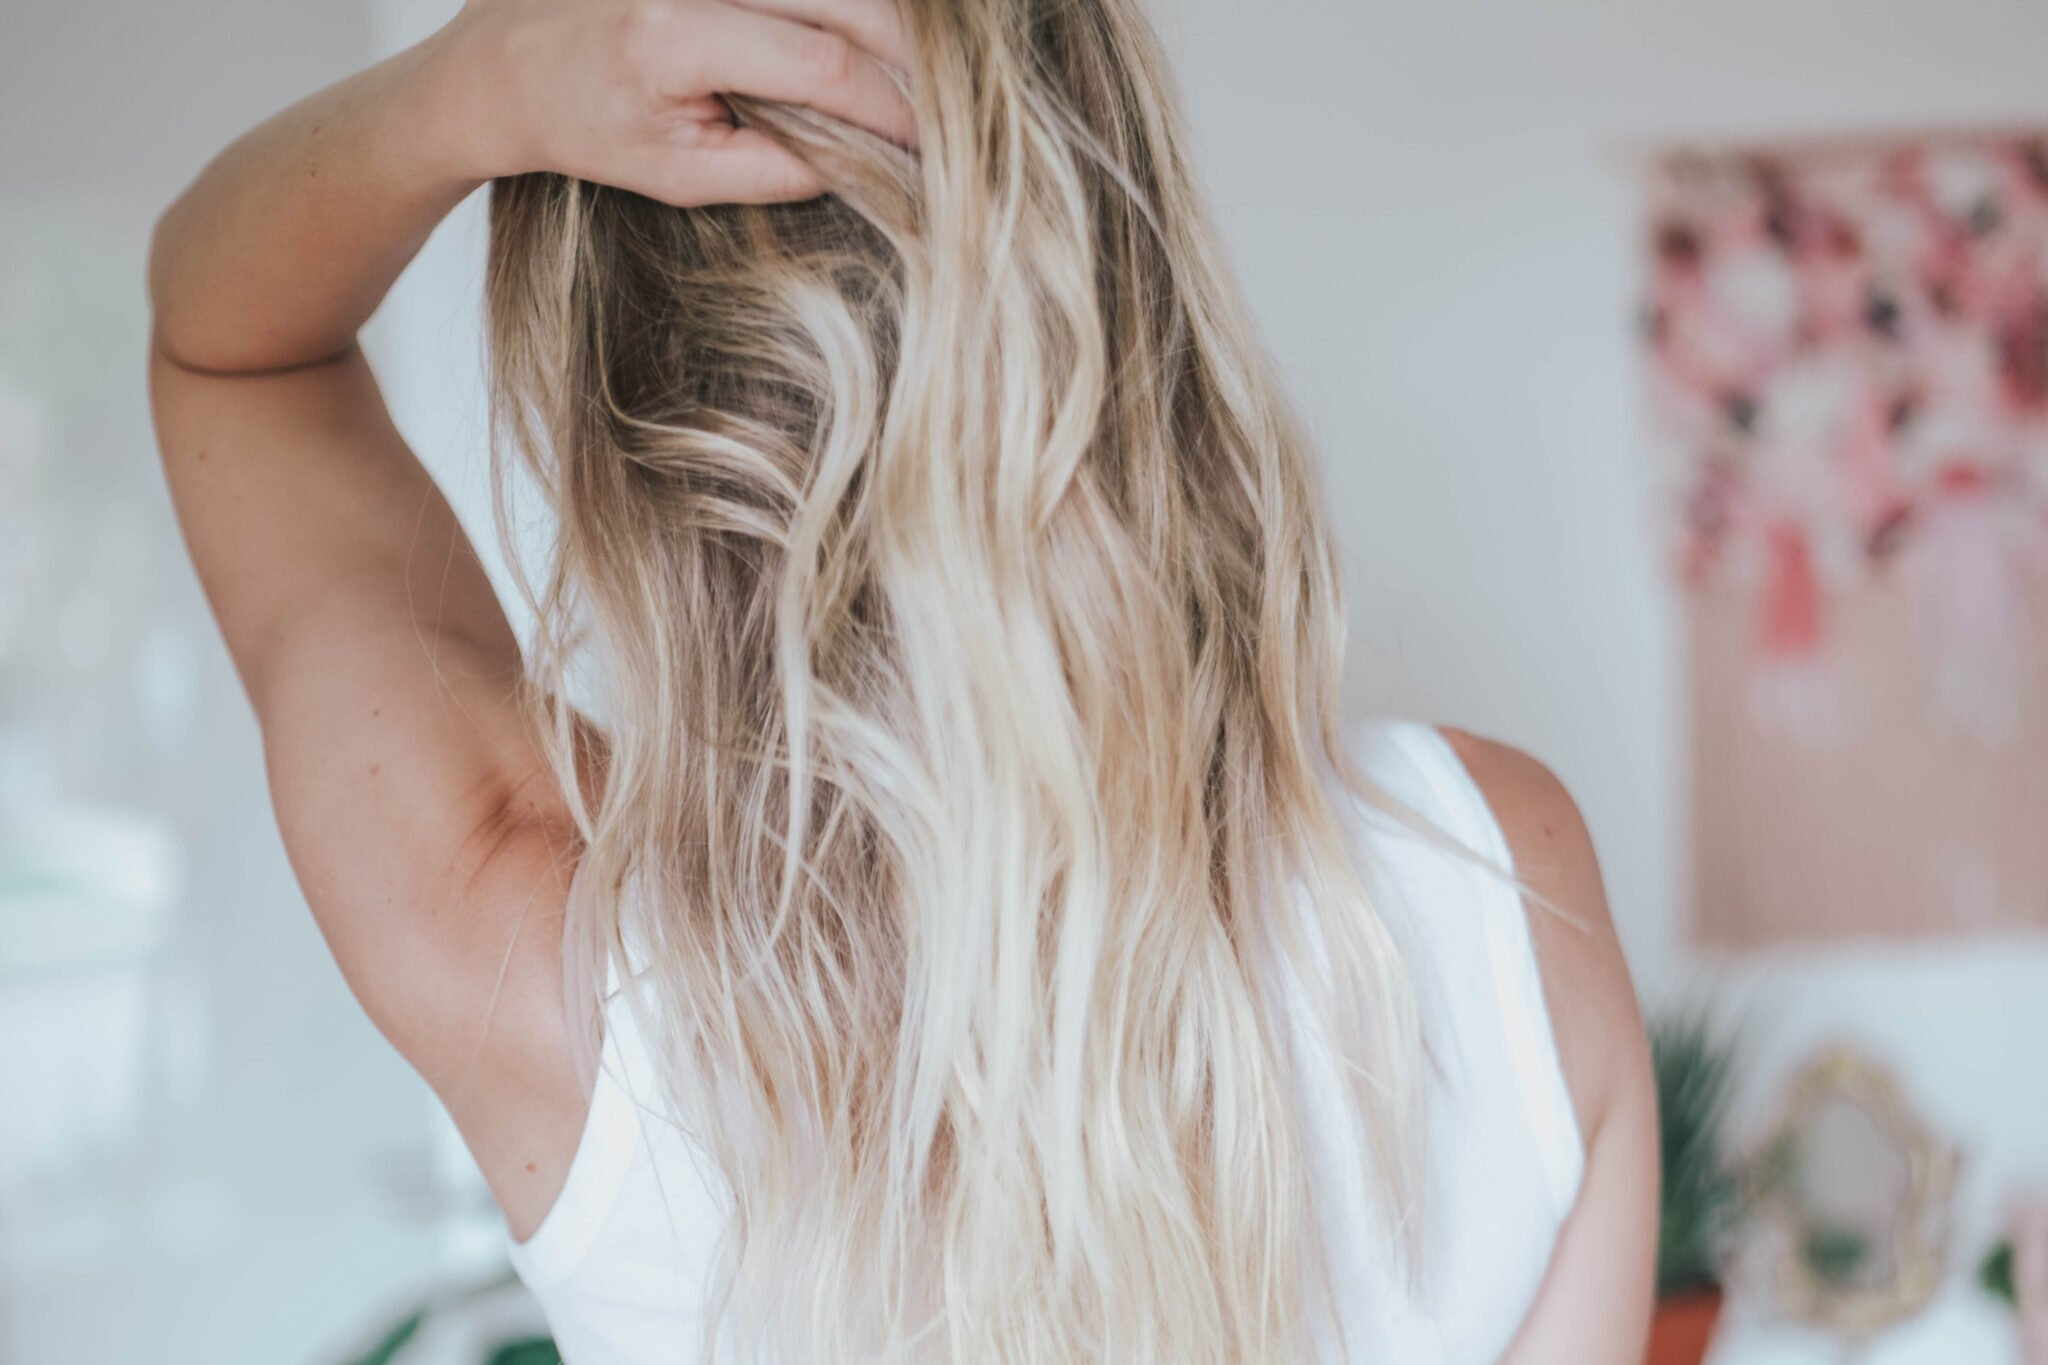 Dry shampoo tips and tricks